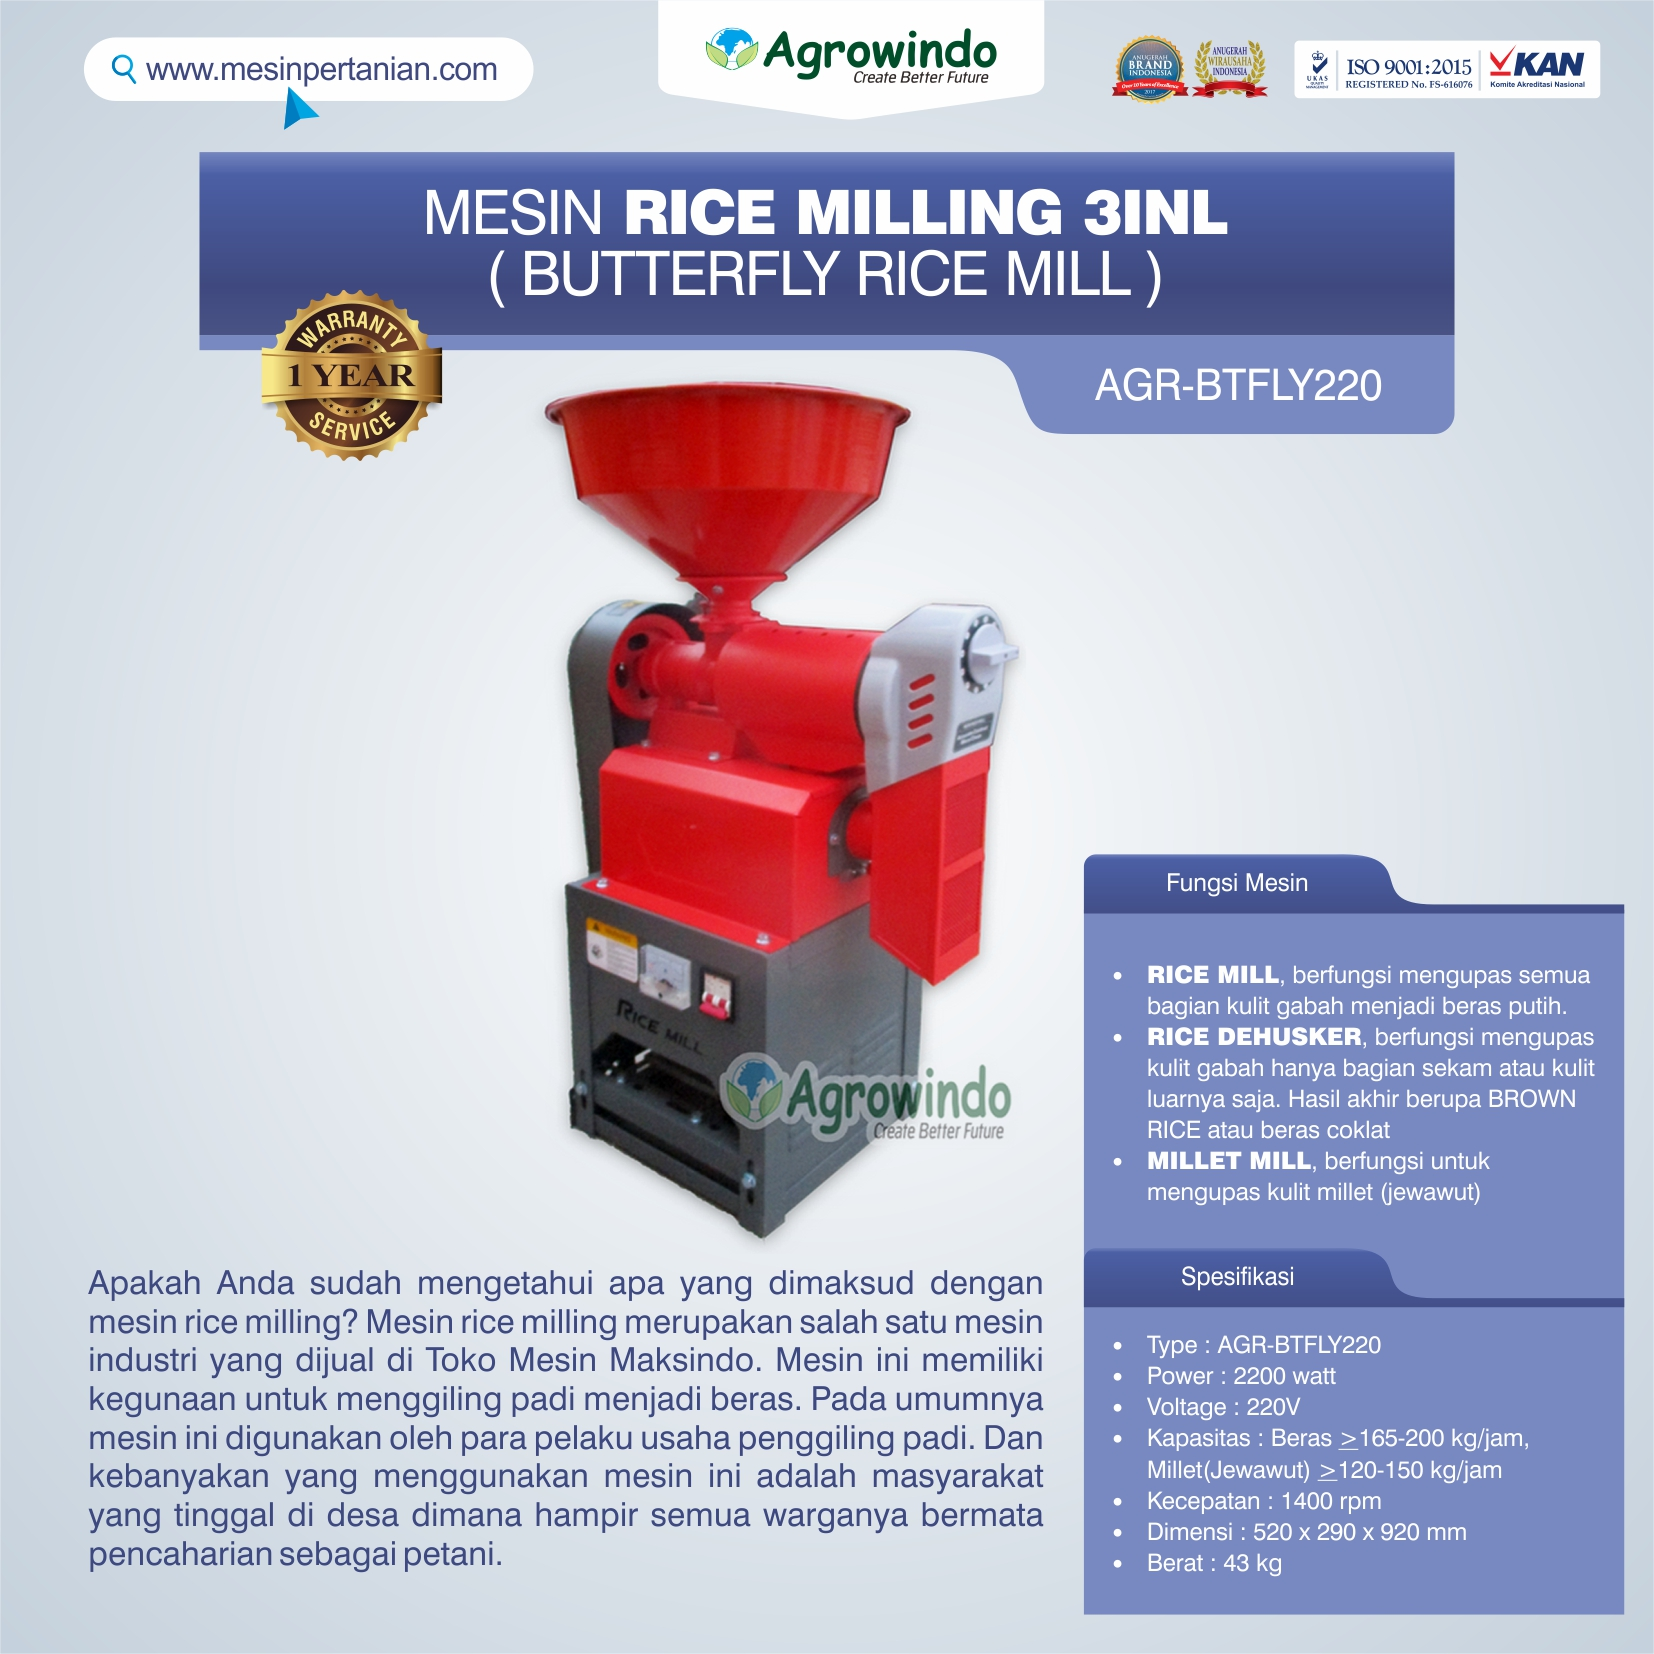 Jual Mesin Rice Milling 3in1 (Butterfly Rice Mill) AGR-BTFLY220 di Banjarmasin